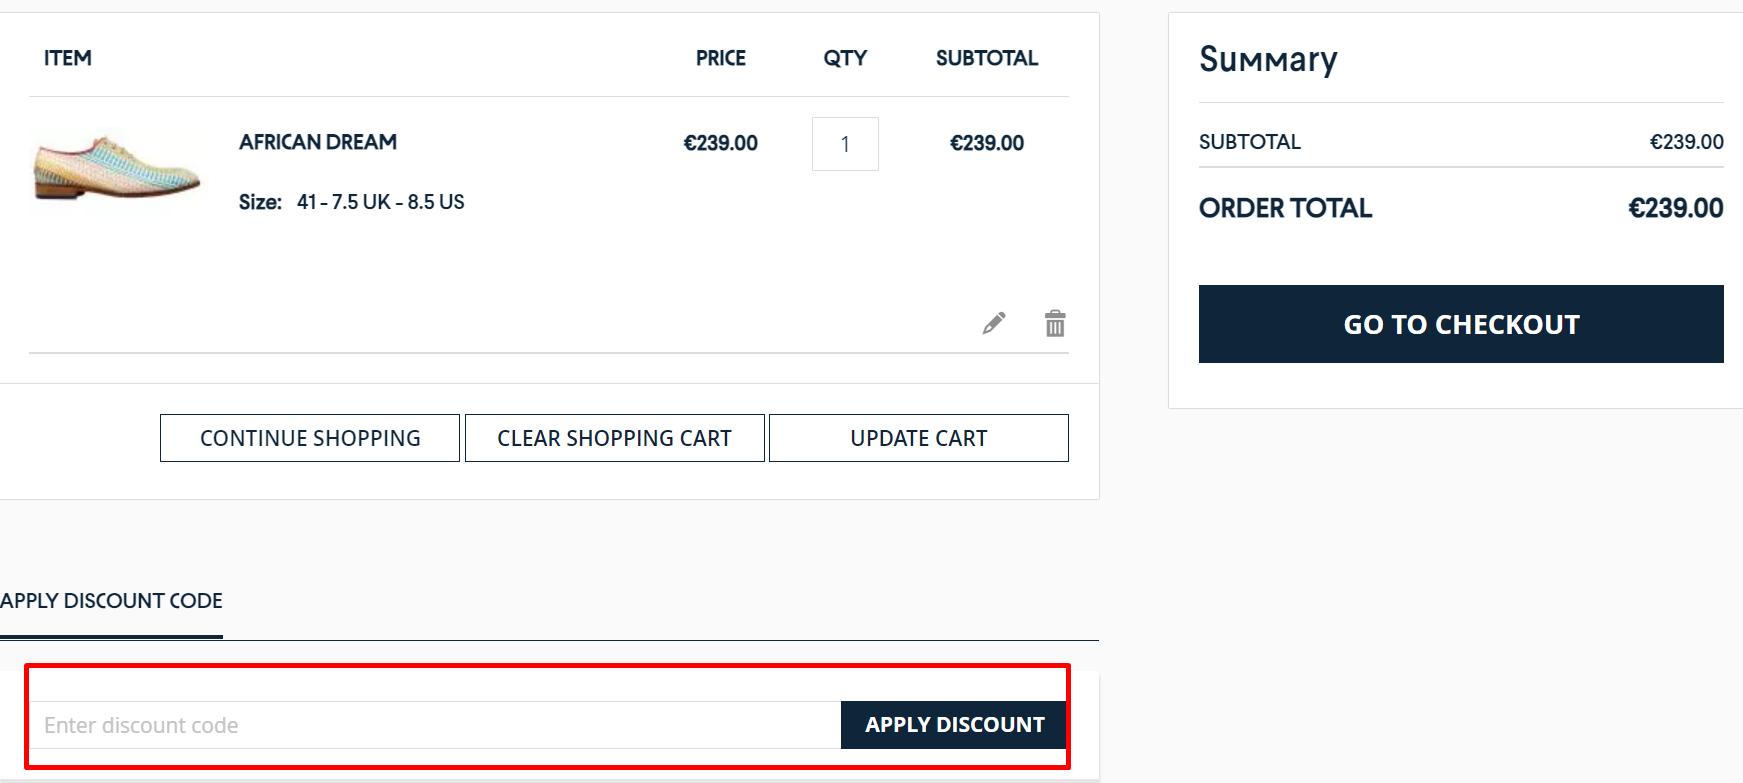 How do I use my Mascolori discount code?